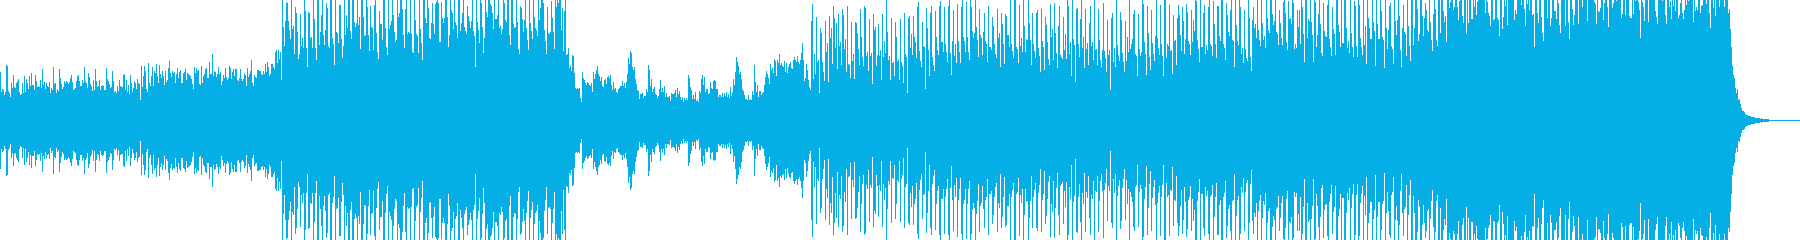 TUBASAの再生済みの波形